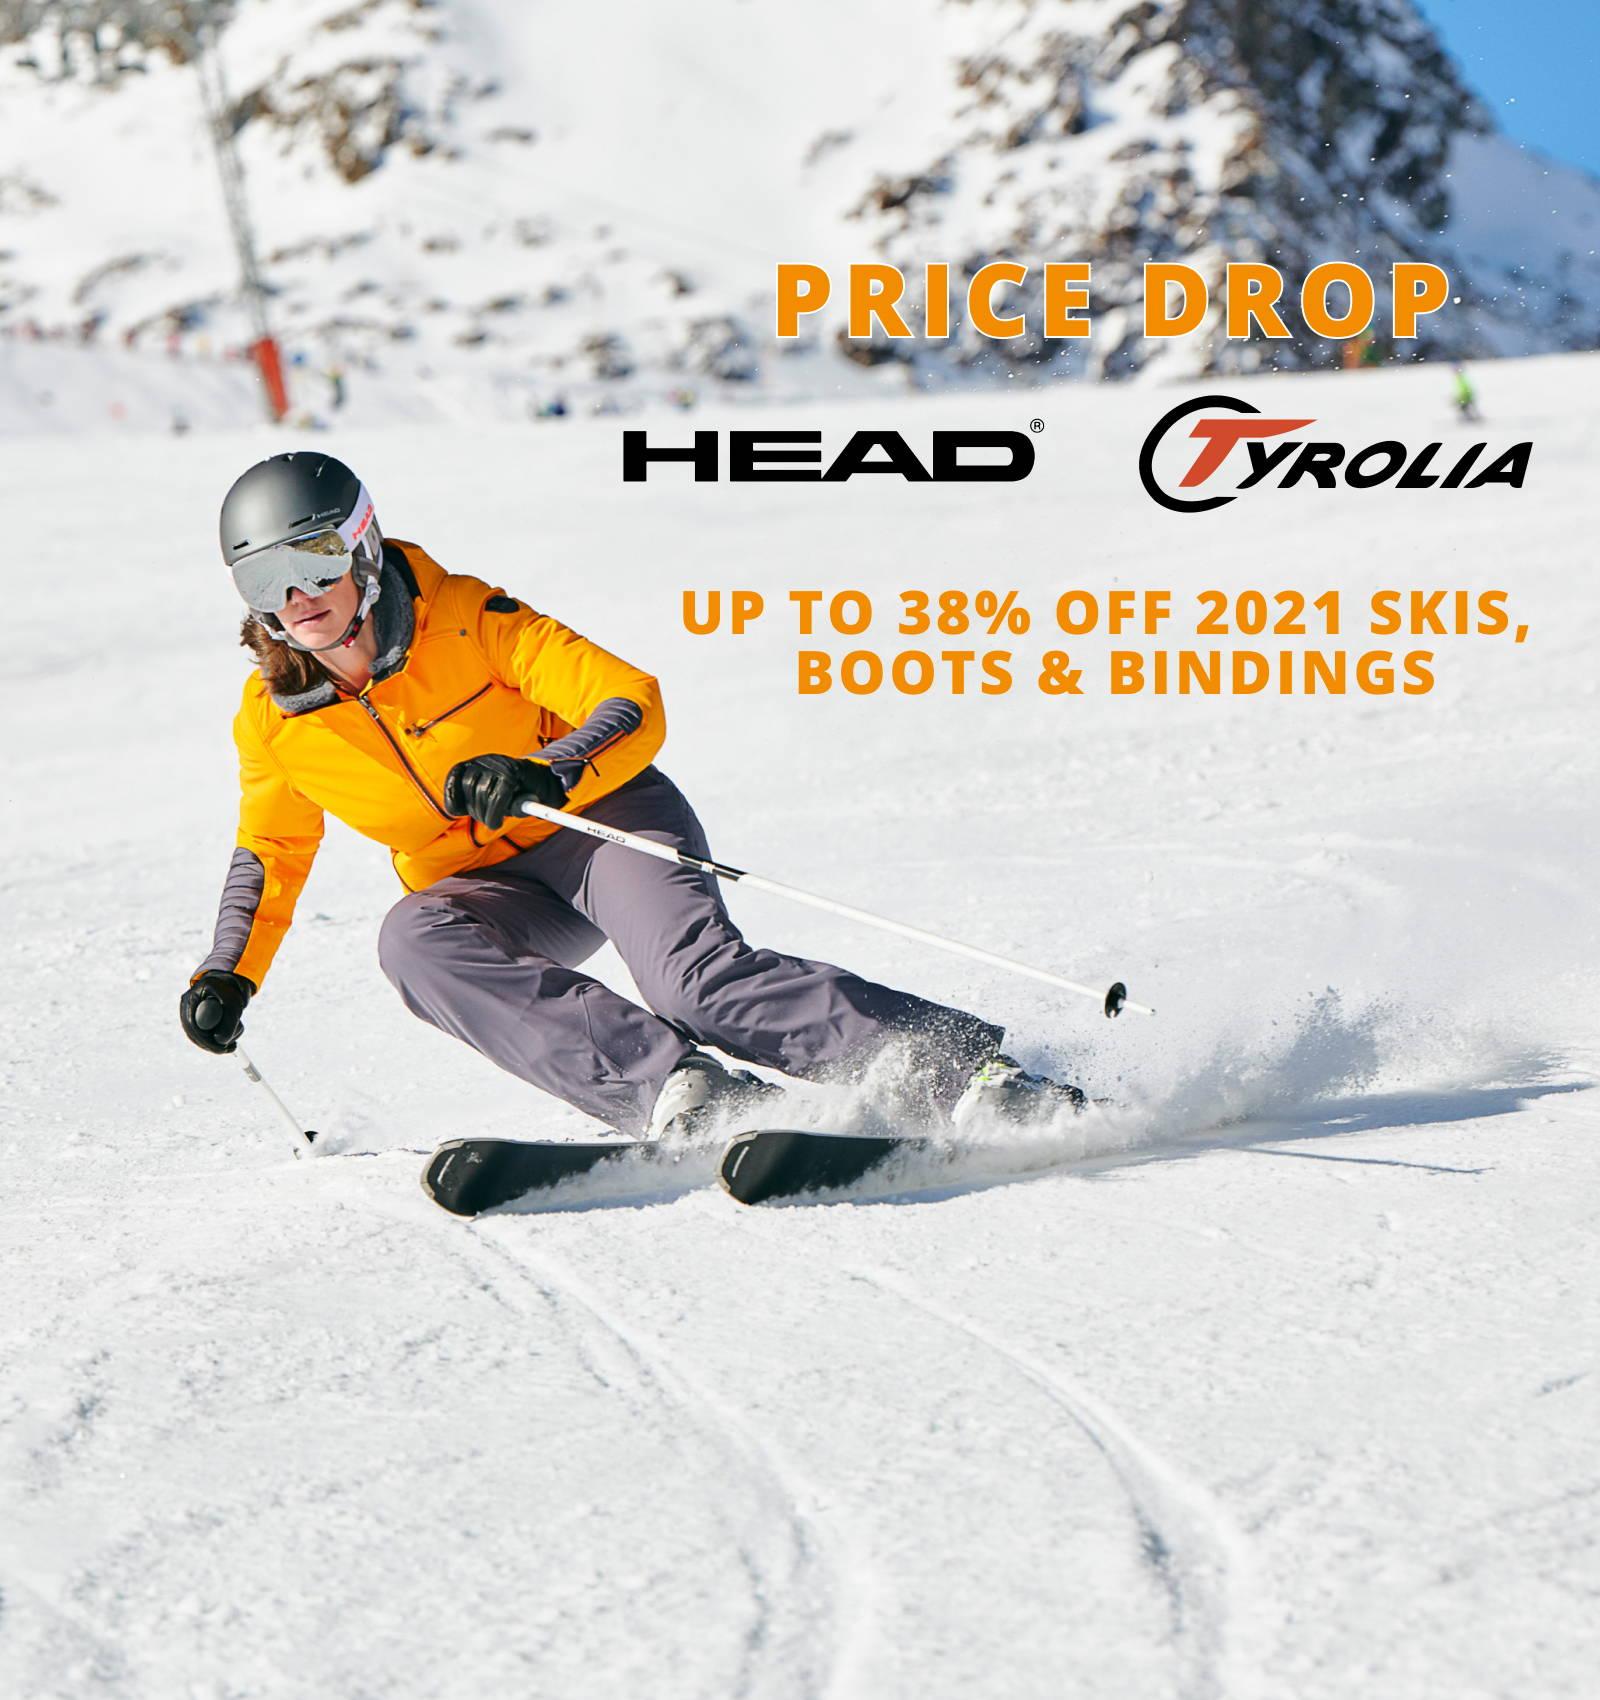 Price Drop Head Tyrolia